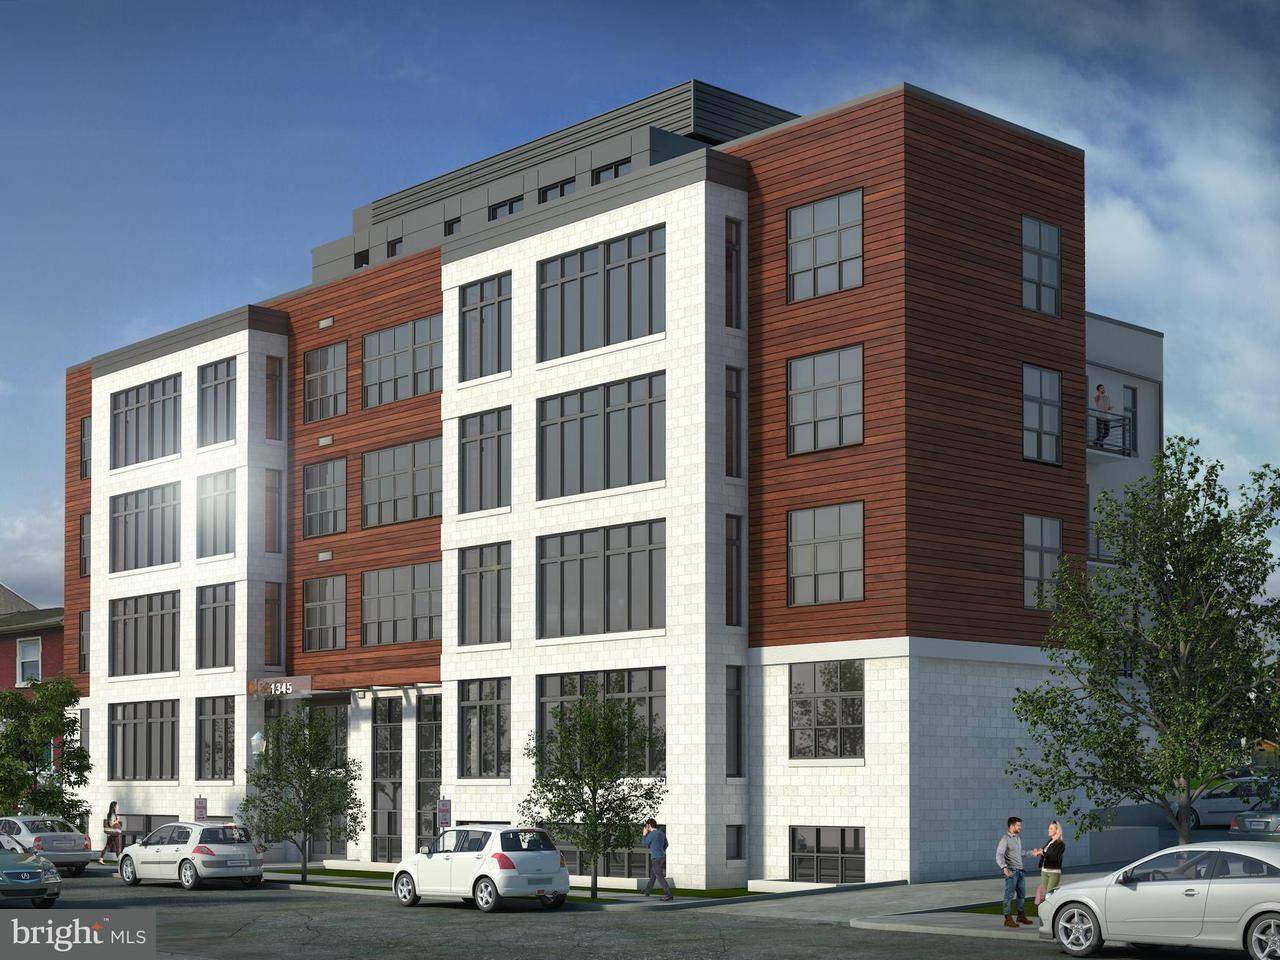 Condominium for Sale at 1345 K St Se #203 1345 K St Se #203 Washington, District Of Columbia 20003 United States